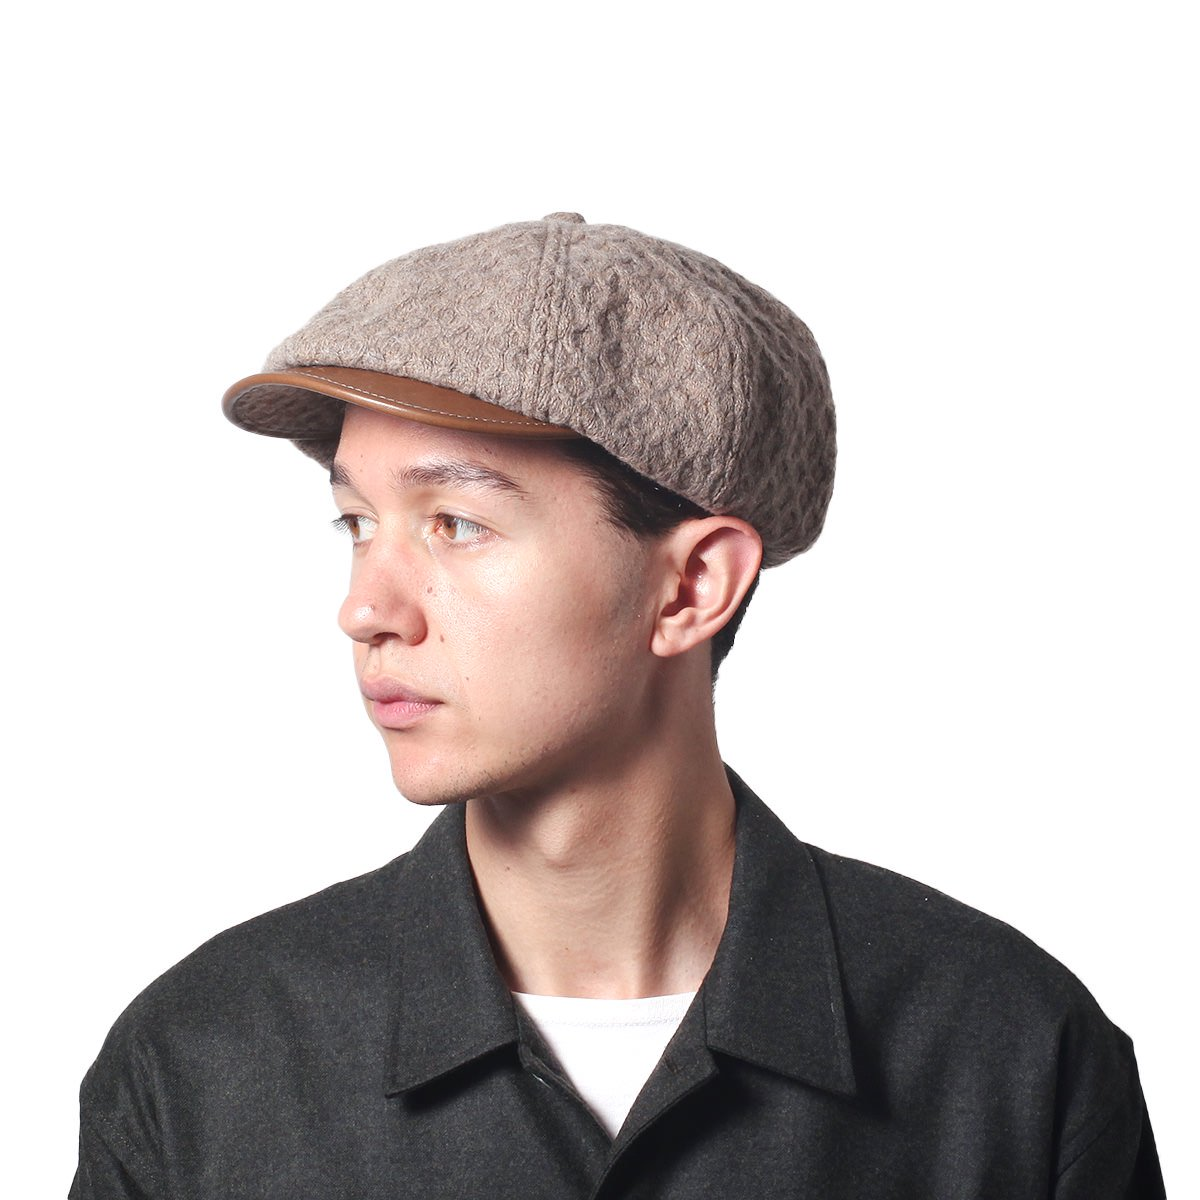 LEATHERxKNIT-TEXTILE H-CAS 詳細画像6